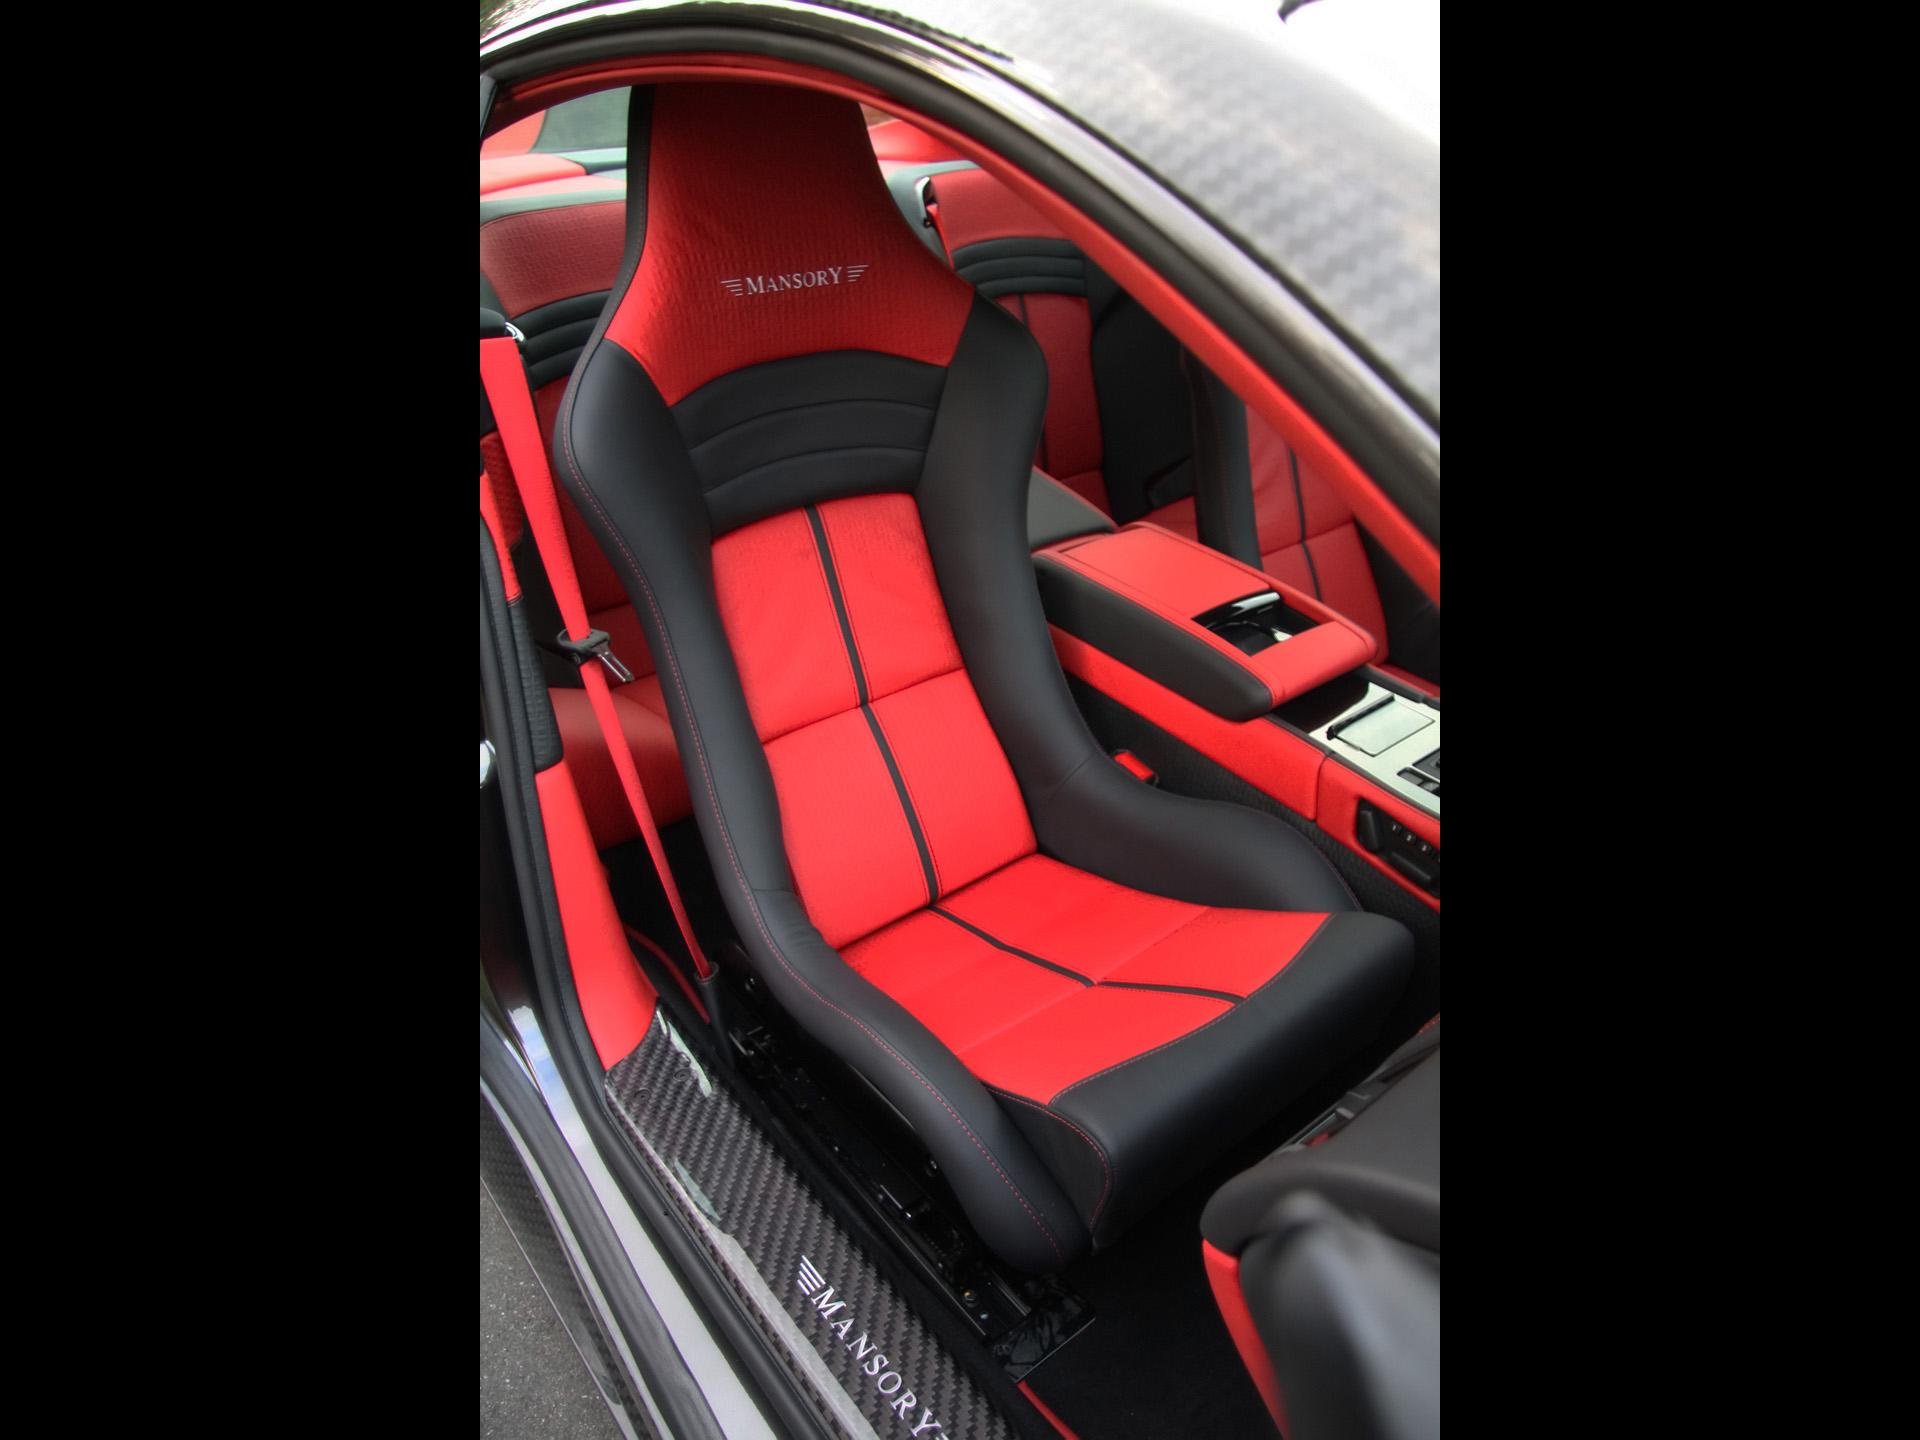 2010 Mansory Cyrus based on Aston Martin DB9 or DBS   Seat HD Wallpaper